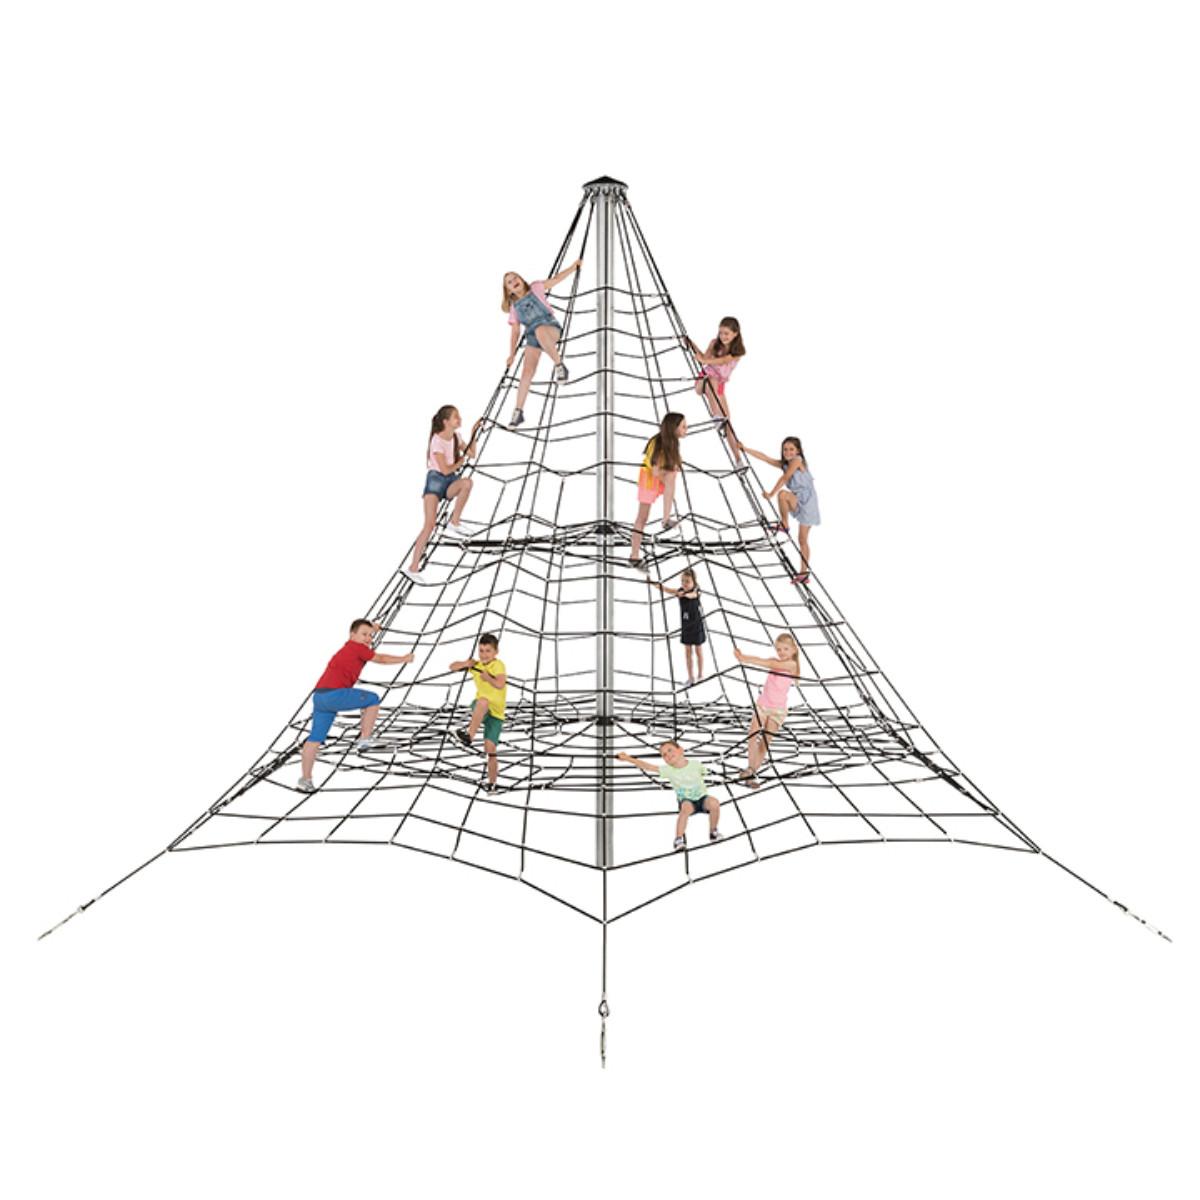 Пирамида из армированого каната 5,5 метра